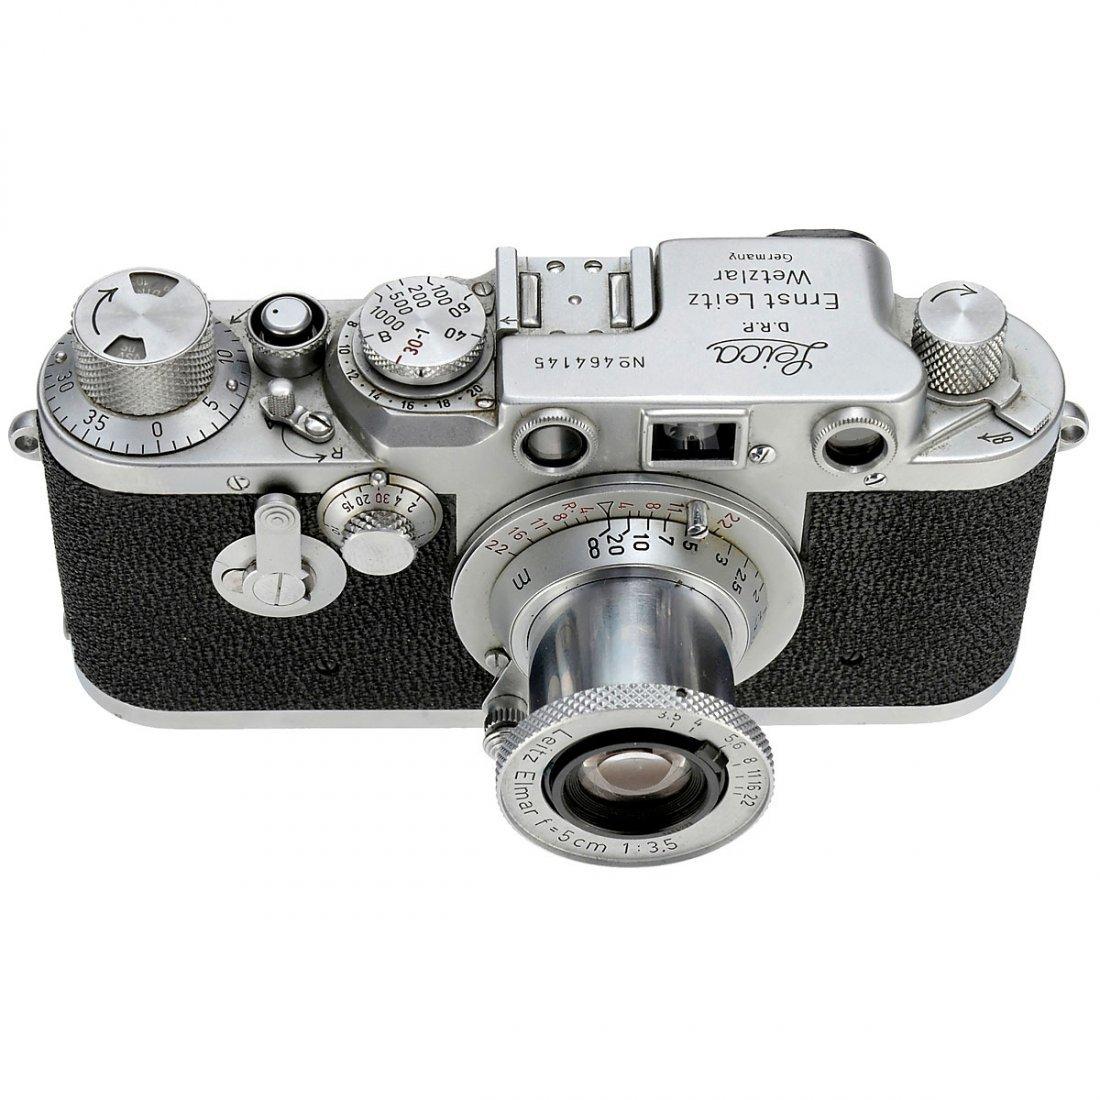 Leica IIIc/IIIf, 1949